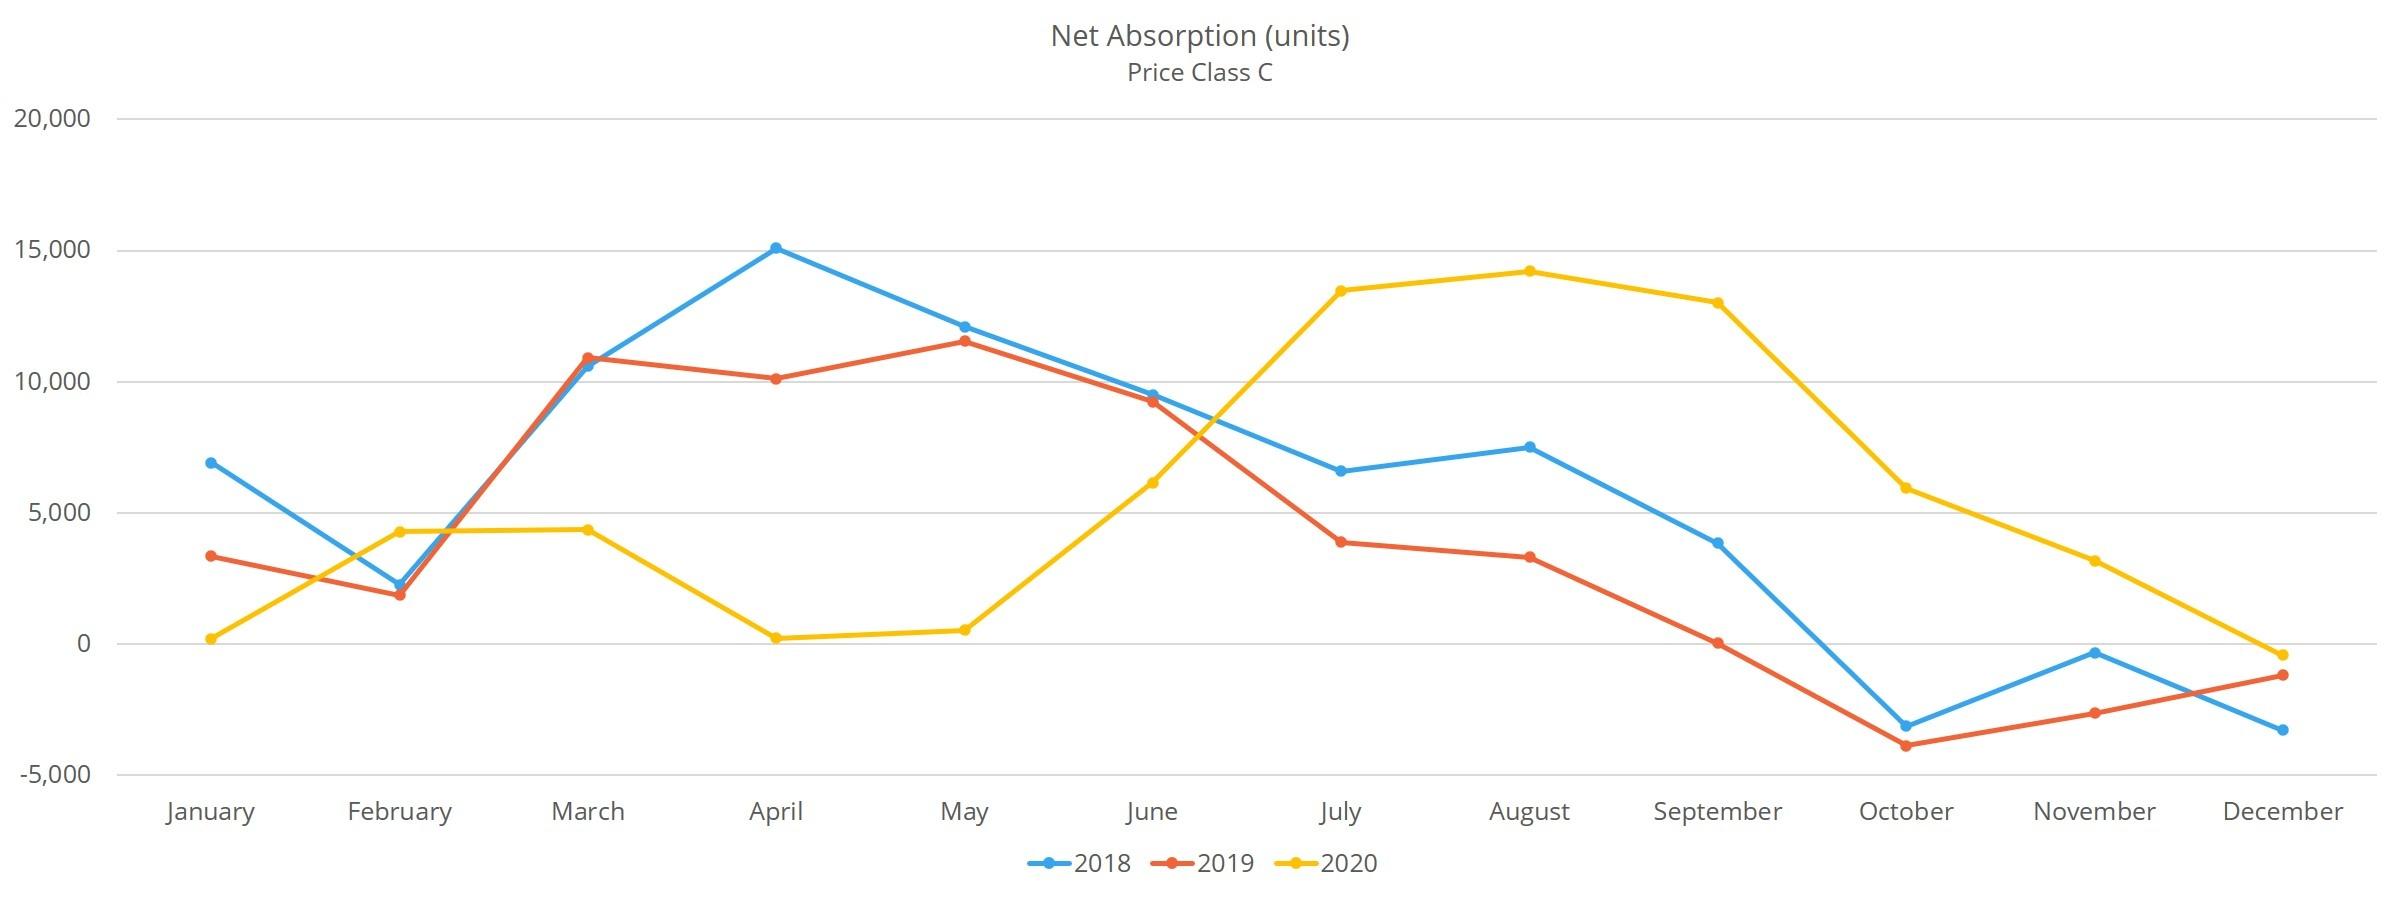 Net Absorption (units)